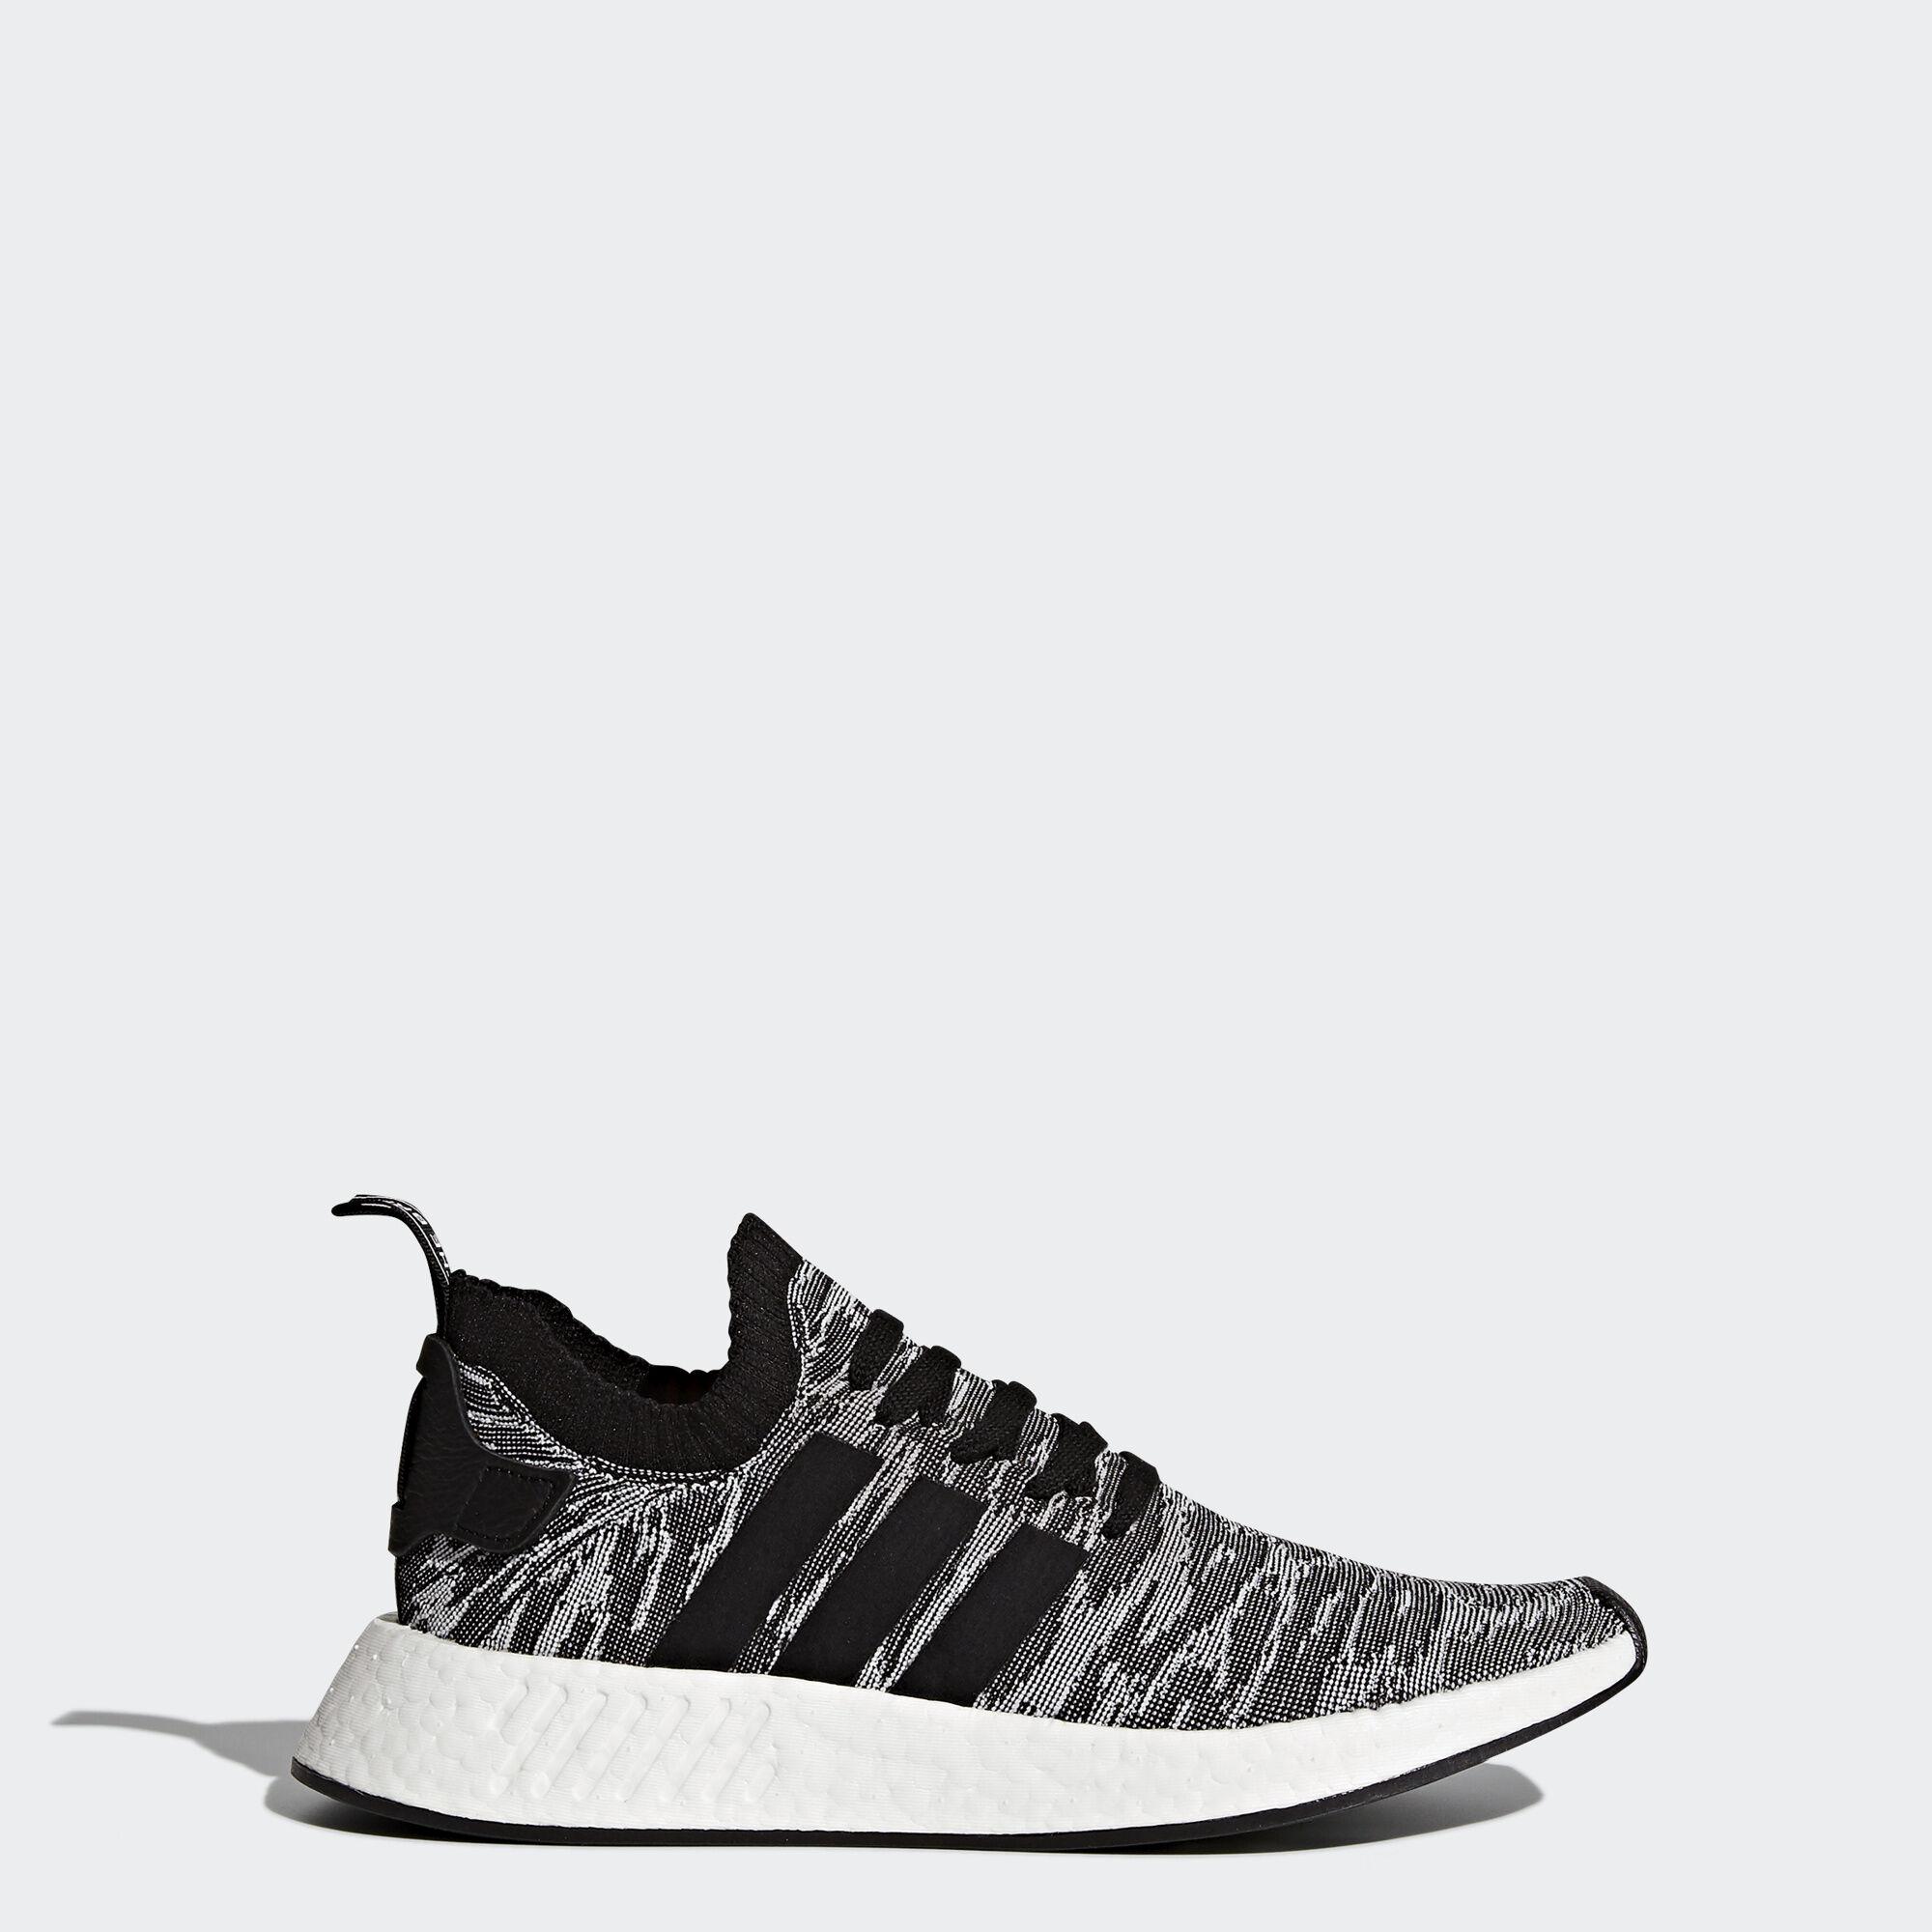 Adidas Originaux Adidas Nmd_r2 Primeknit Chaussures De Sport - Gris dH69hIpyux